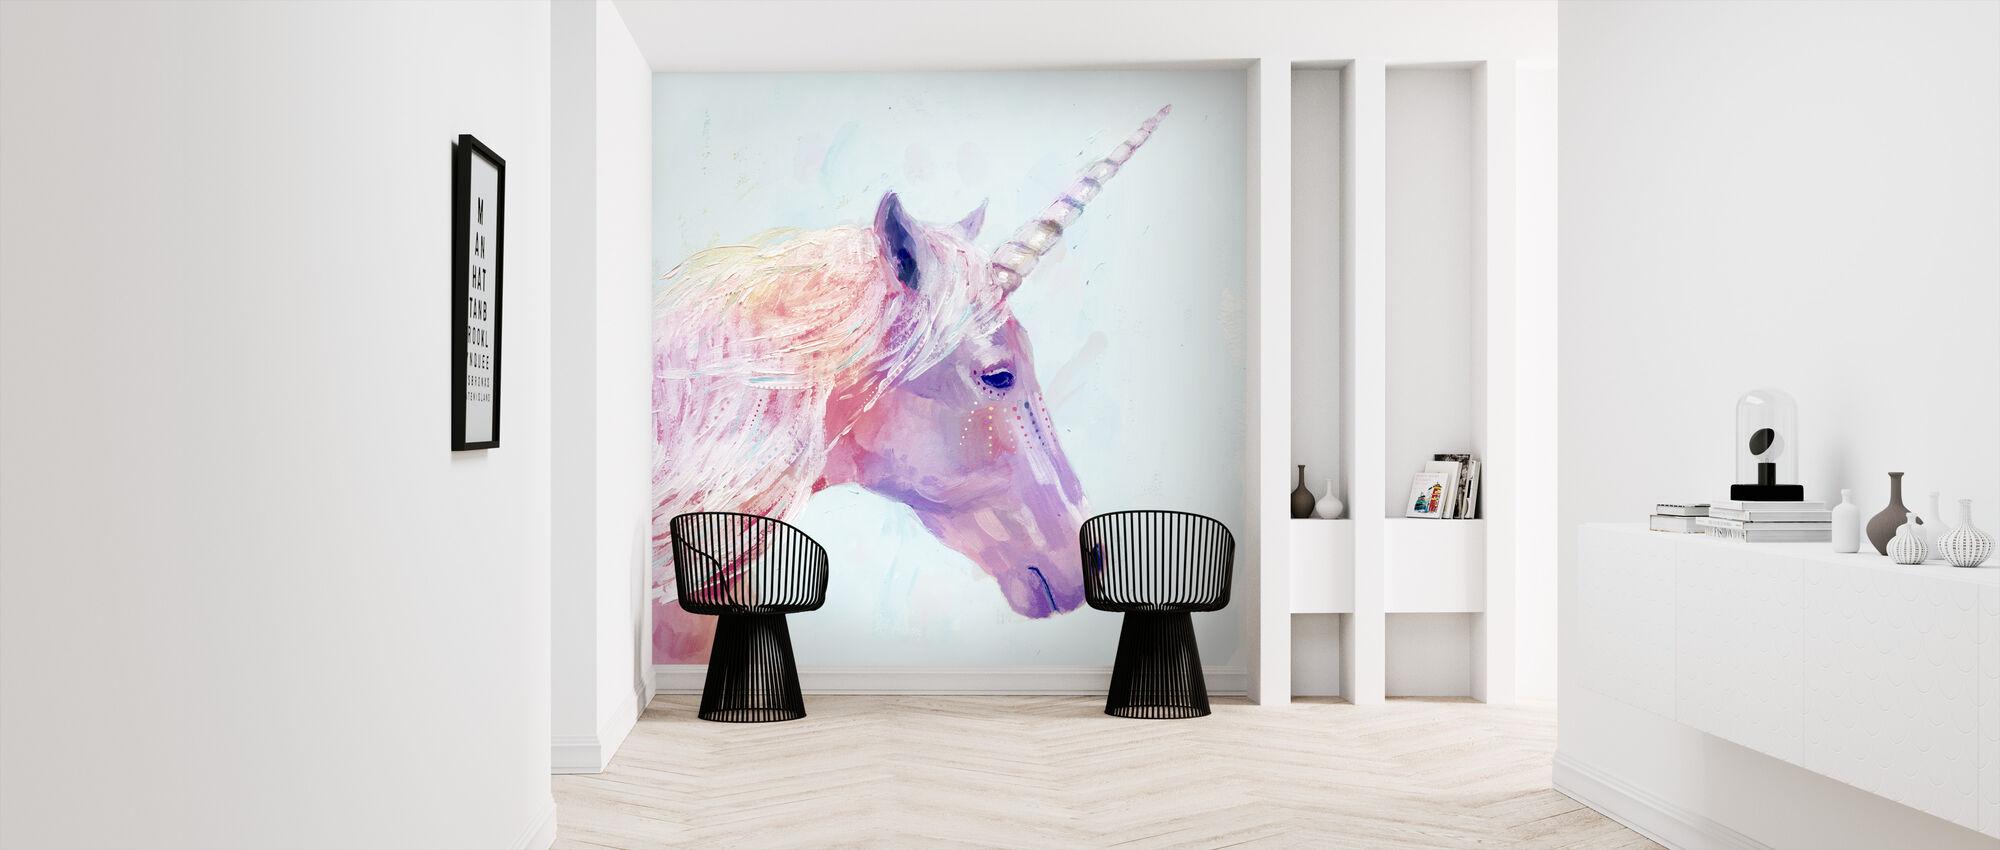 Mystic Unicorn - Wallpaper - Hallway